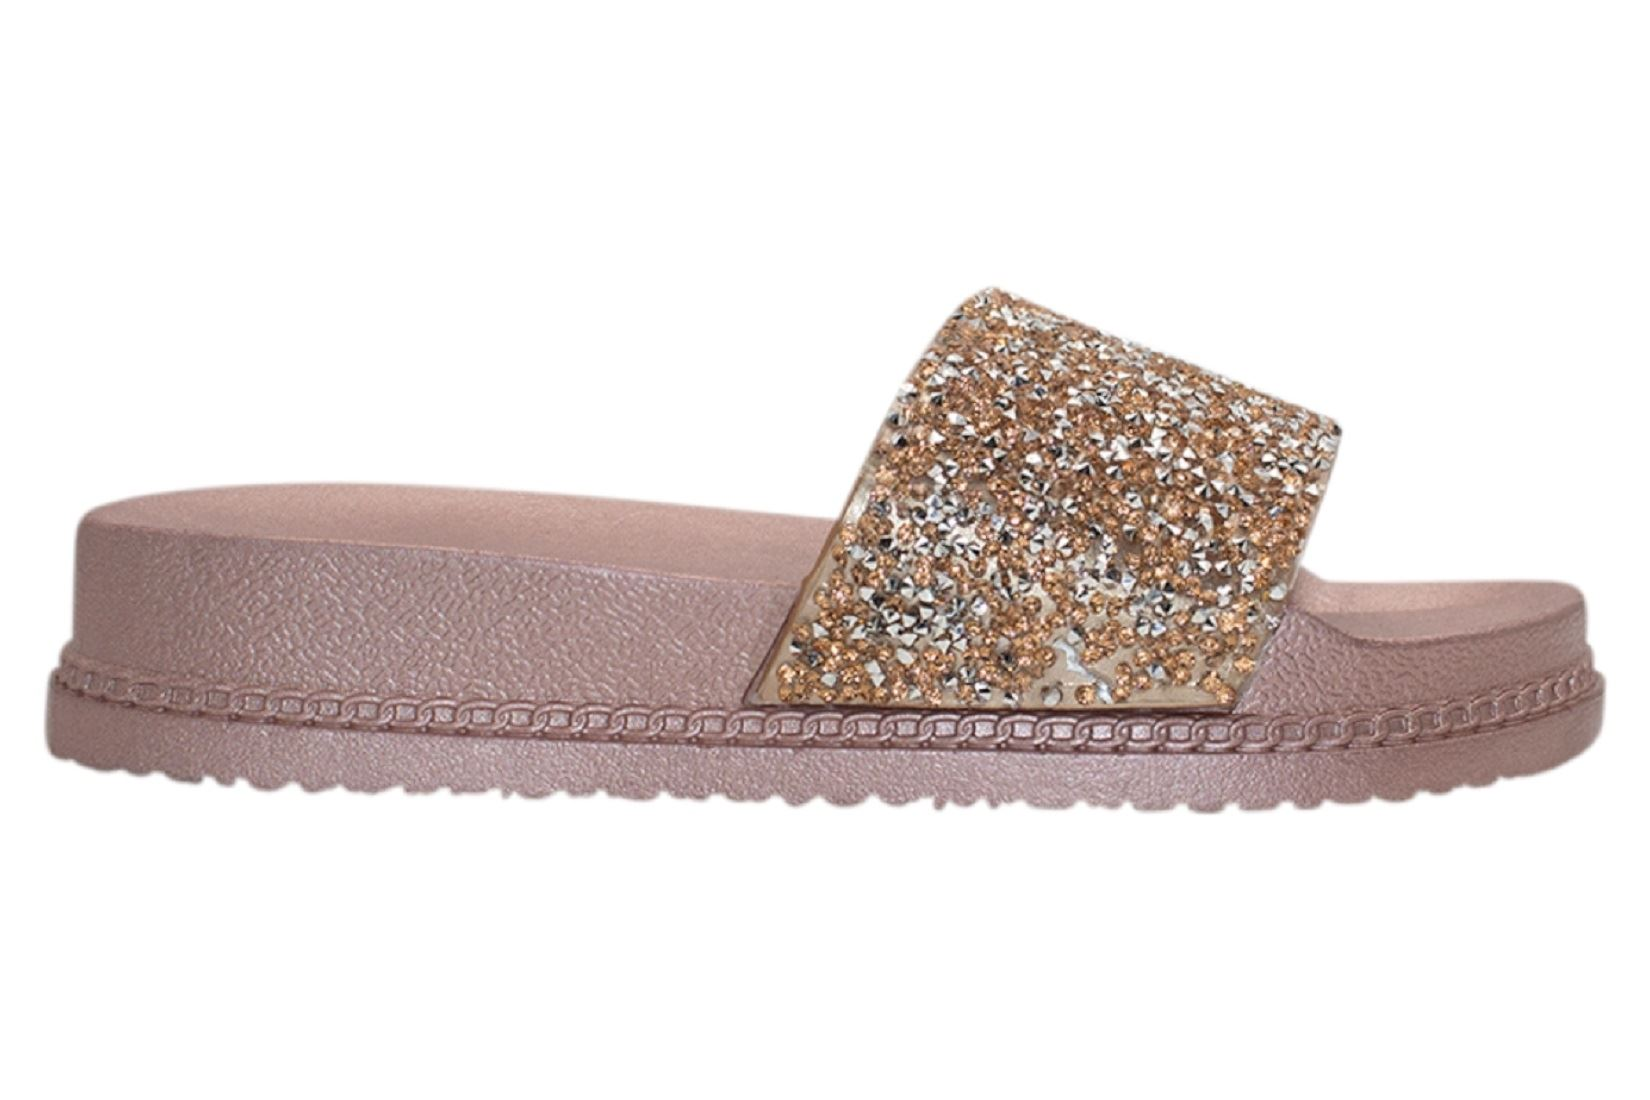 Womens-Sliders-Casual-Slippers-Mules-Ladies-Diamante-Flip-Flop-Sandals-Shoes thumbnail 26